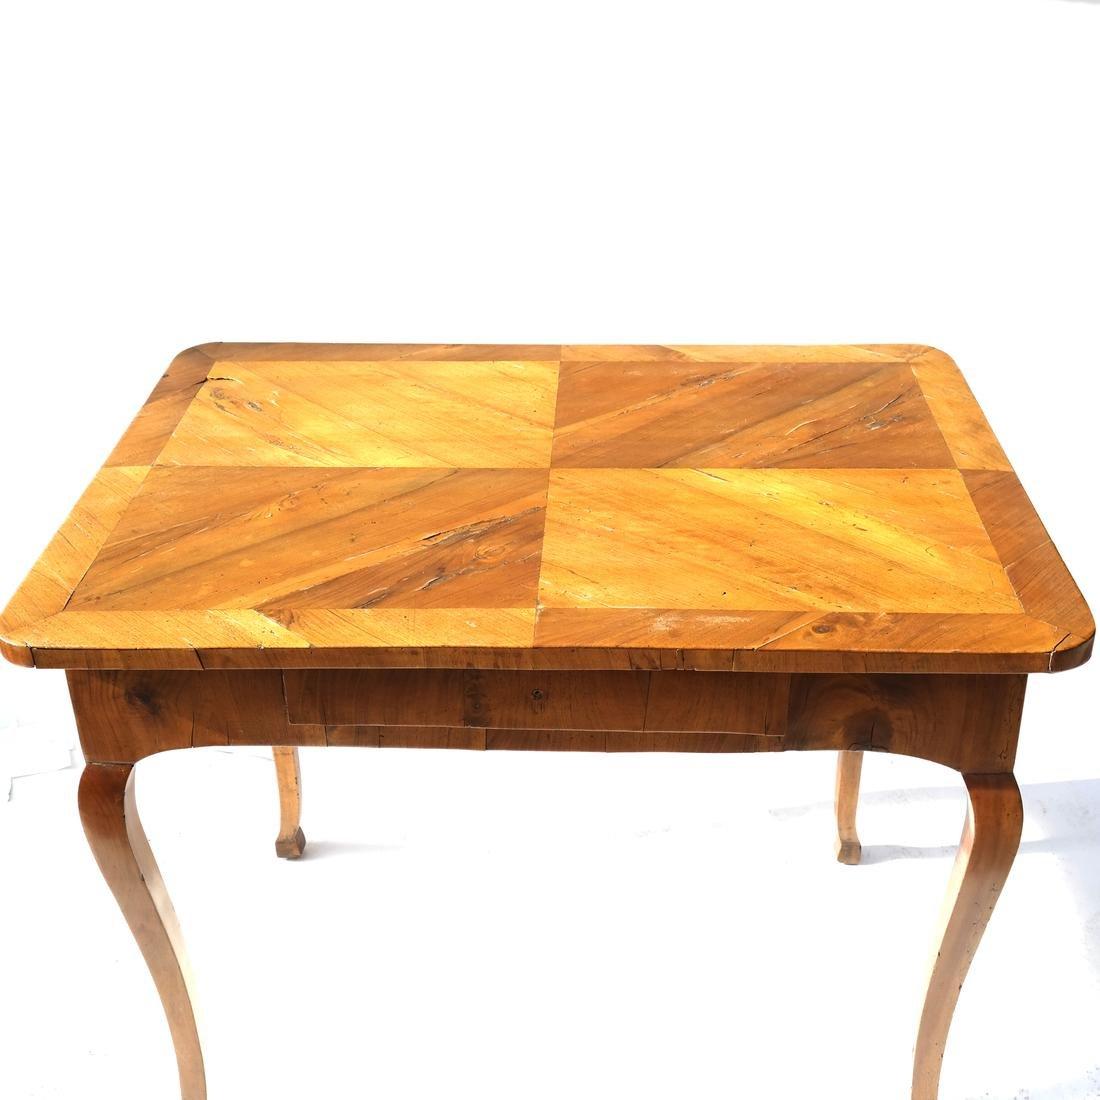 19th Century Continental Desk - 2